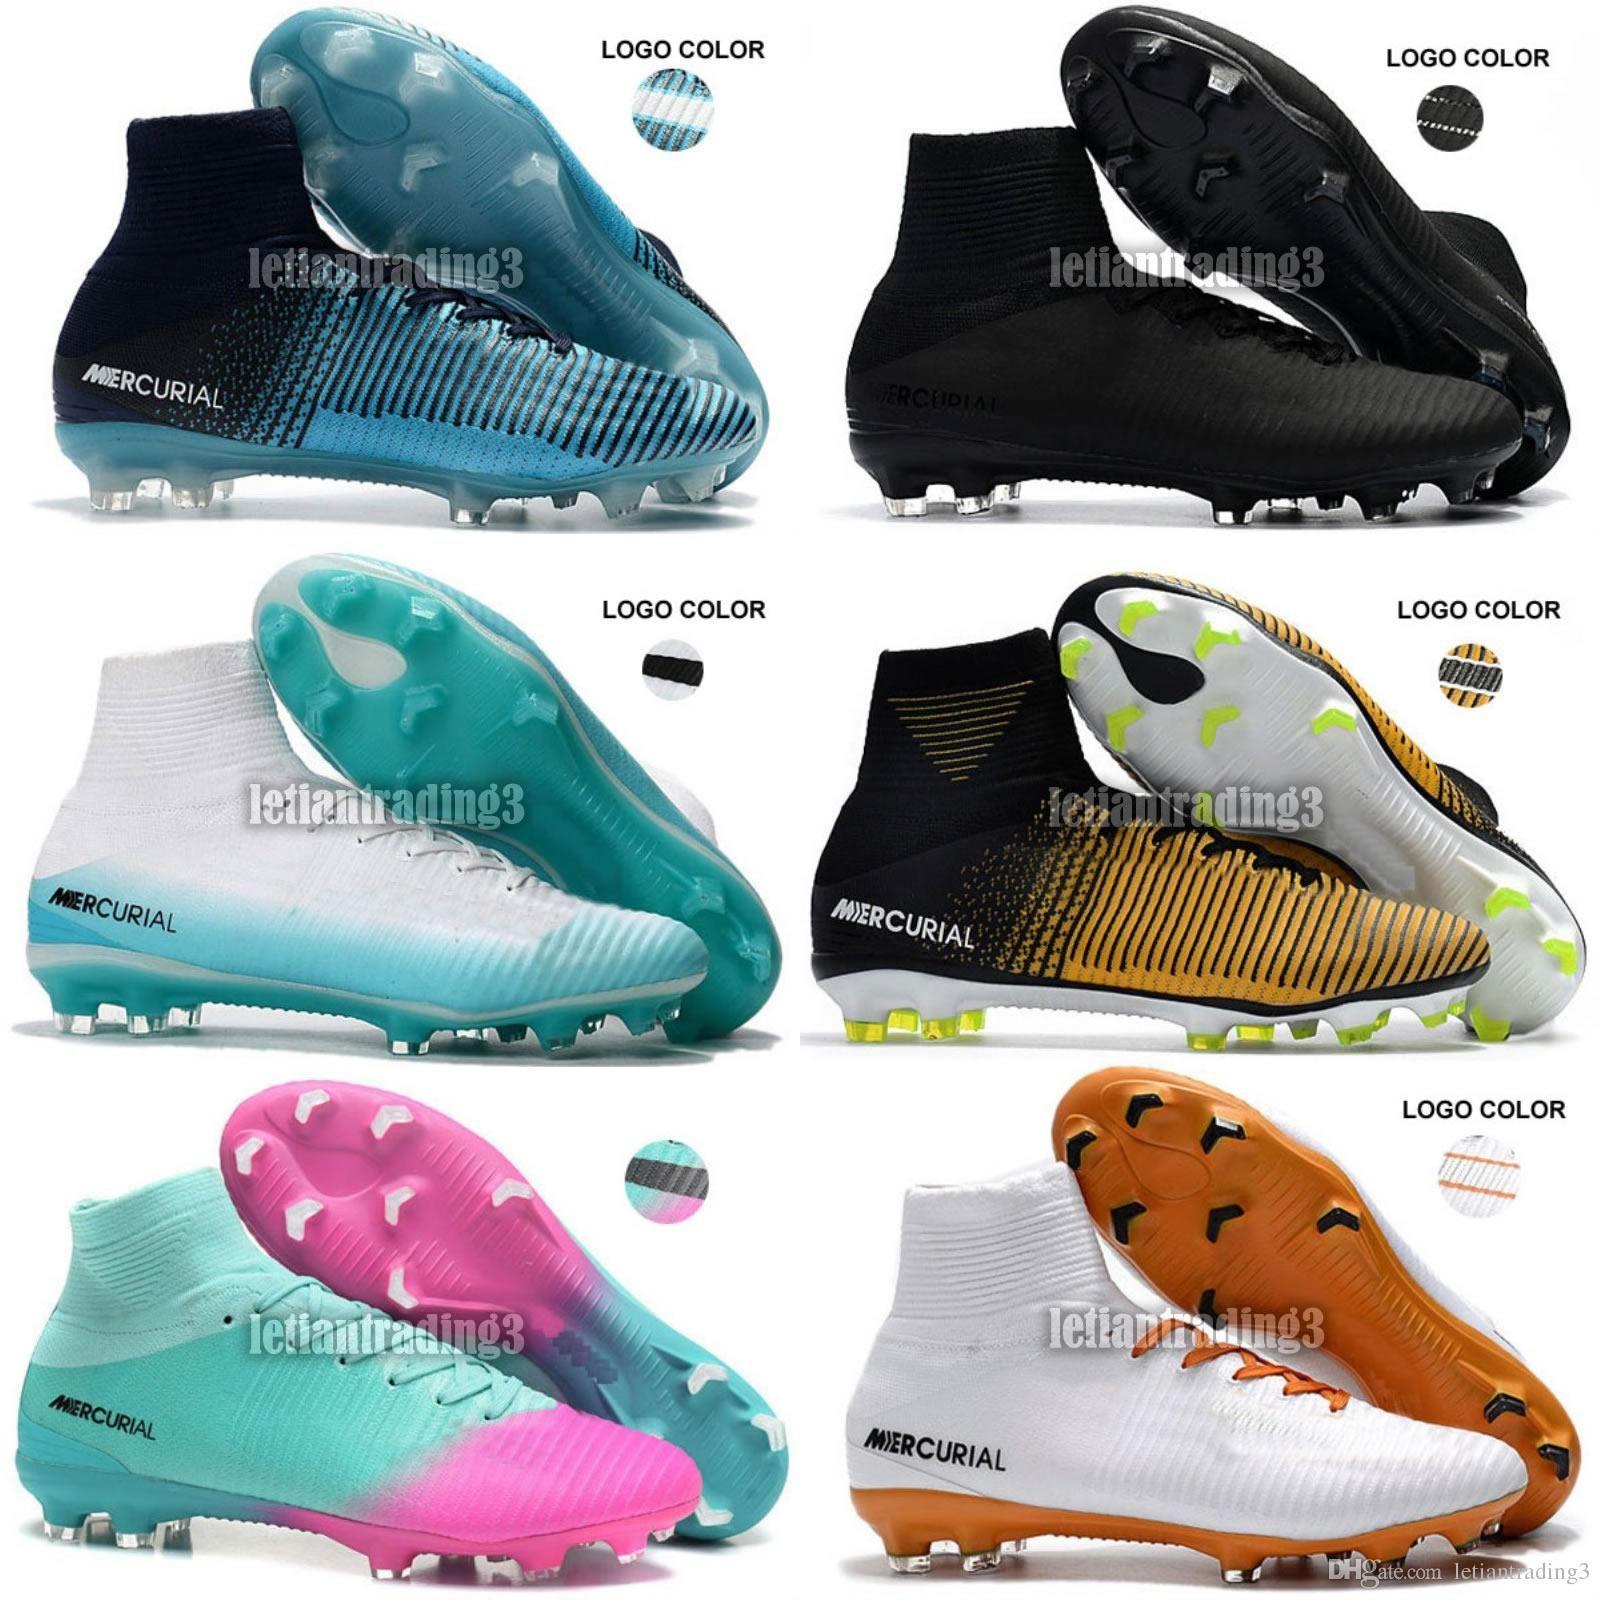 Compre 2017 Envío Gratis Cristiano Ronaldo Mercurial Superfly Tacos Cr7 Ag  Fg Mens Botas De Fútbol Zapatos Baratos Originales Superflys Acc Zapatos De  ... e0579d4c43b06